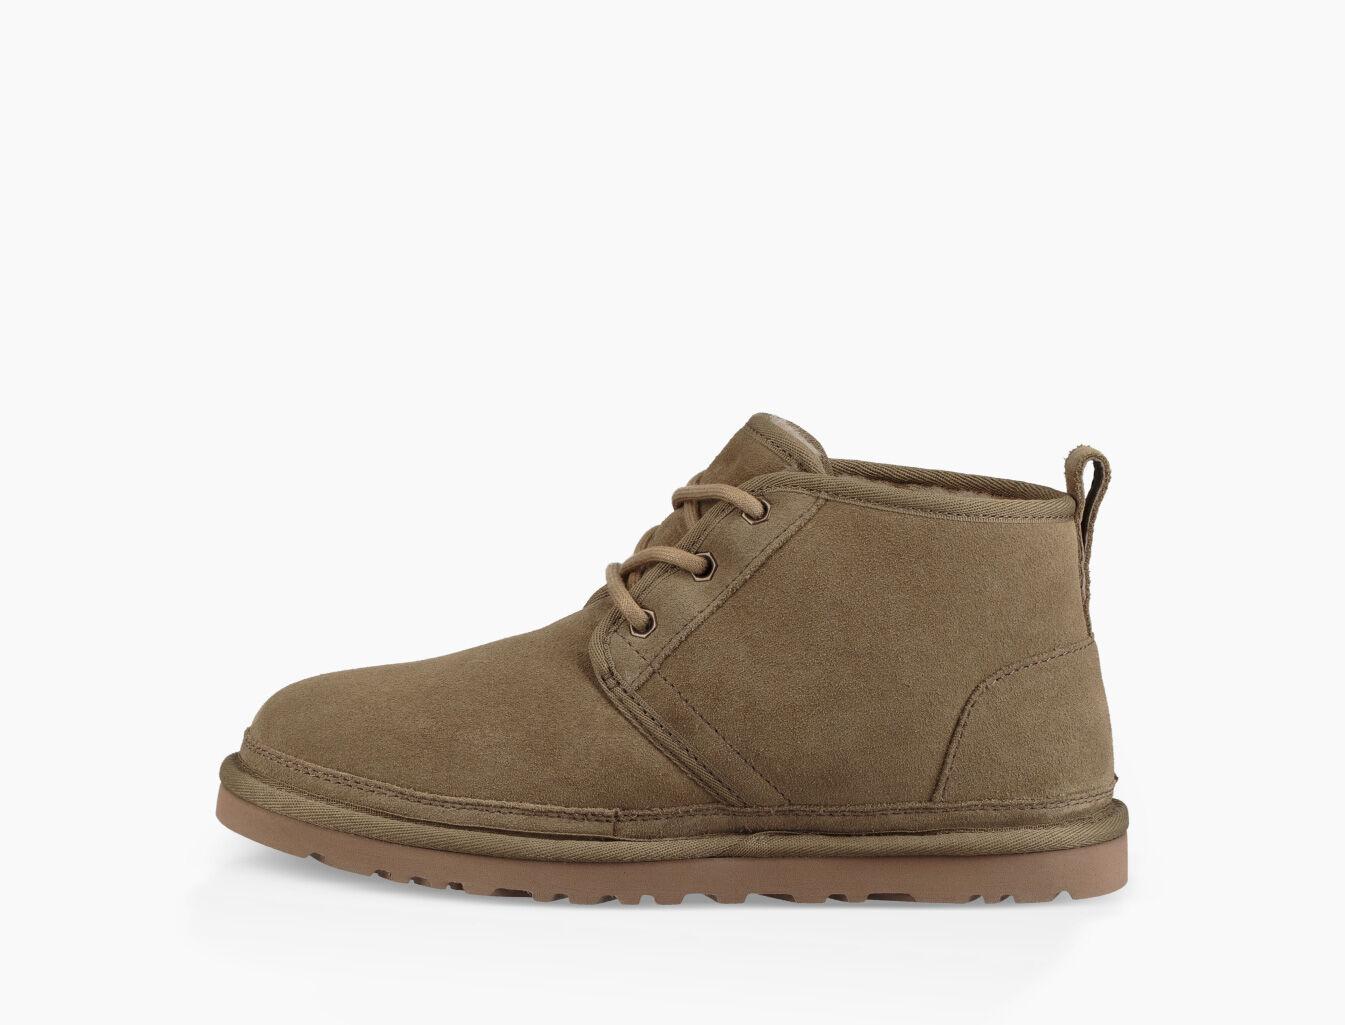 neumel ugg boots womens